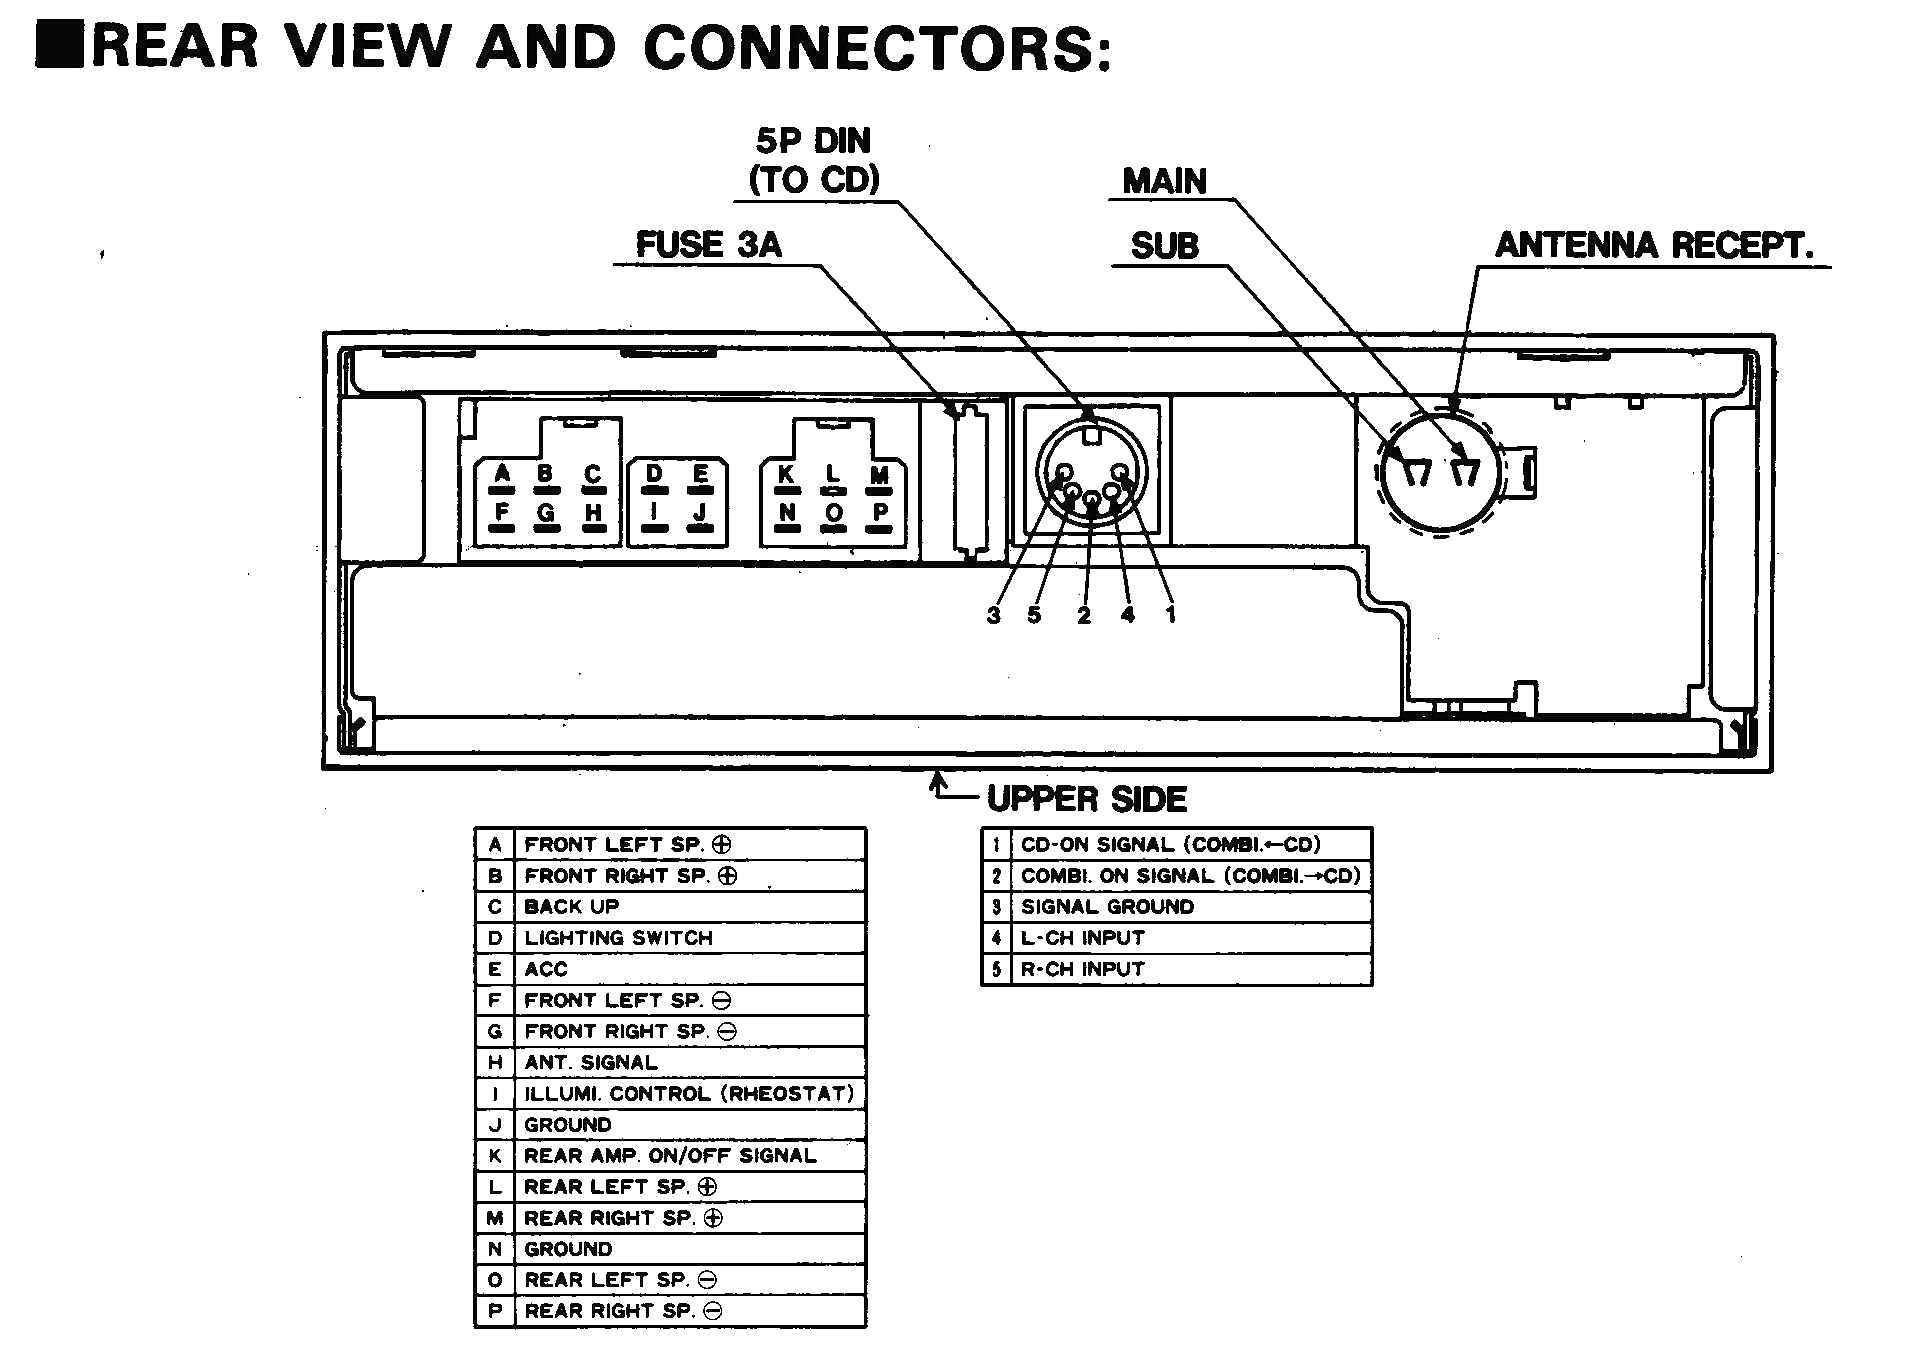 Factory Car Stereo Wiring Diagrams Factory Car Stereo Wiring Diagrams In Jpg Striking Speaker Diagram Of Factory Car Stereo Wiring Diagrams